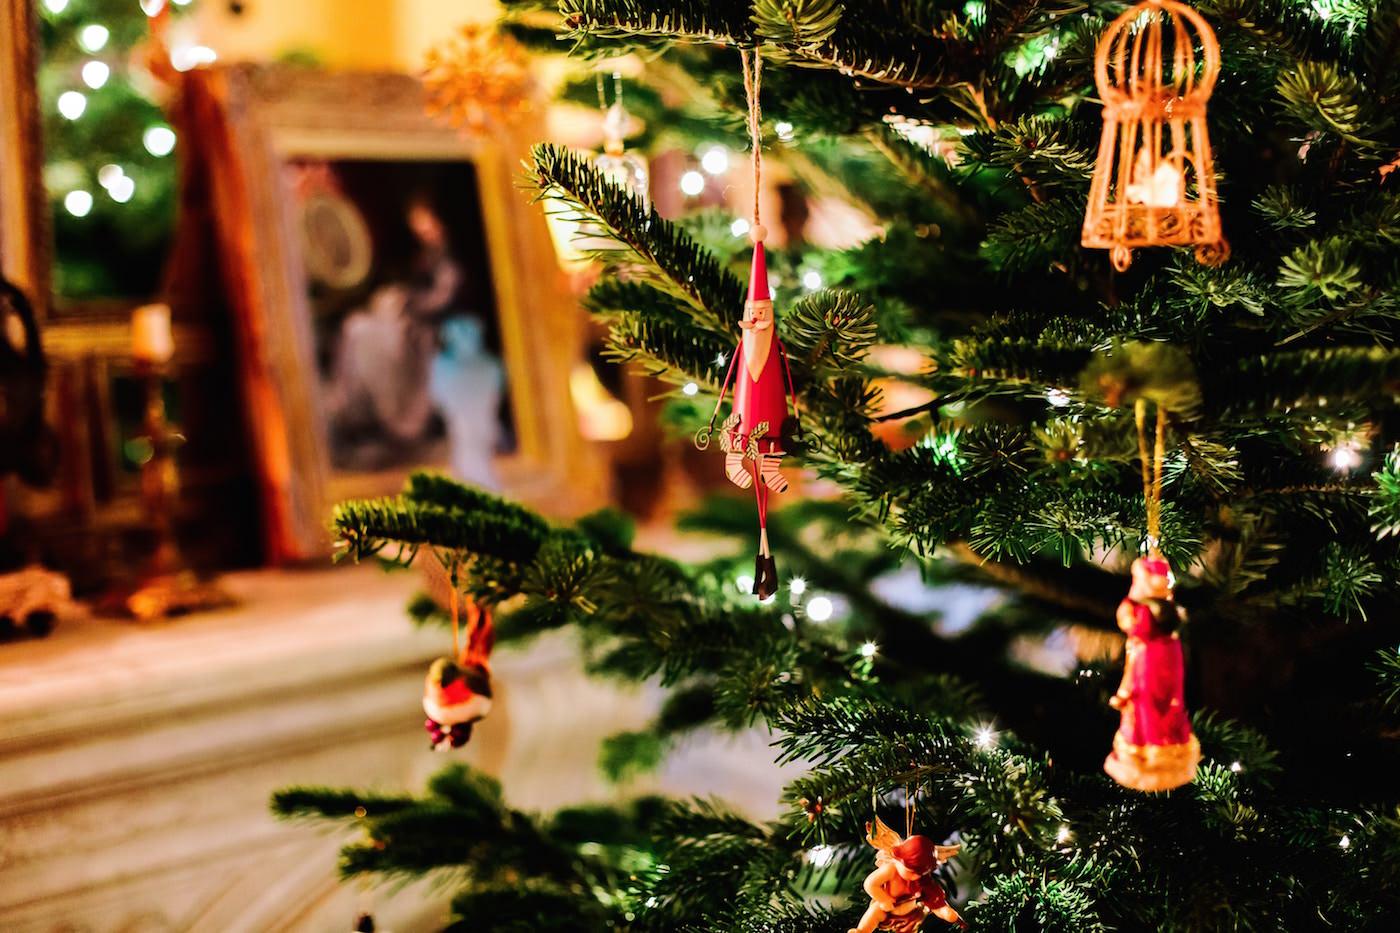 Jesus And Christmas Trees Part - 48: 5 Ways To Center Your Family Around Jesus This Christmas